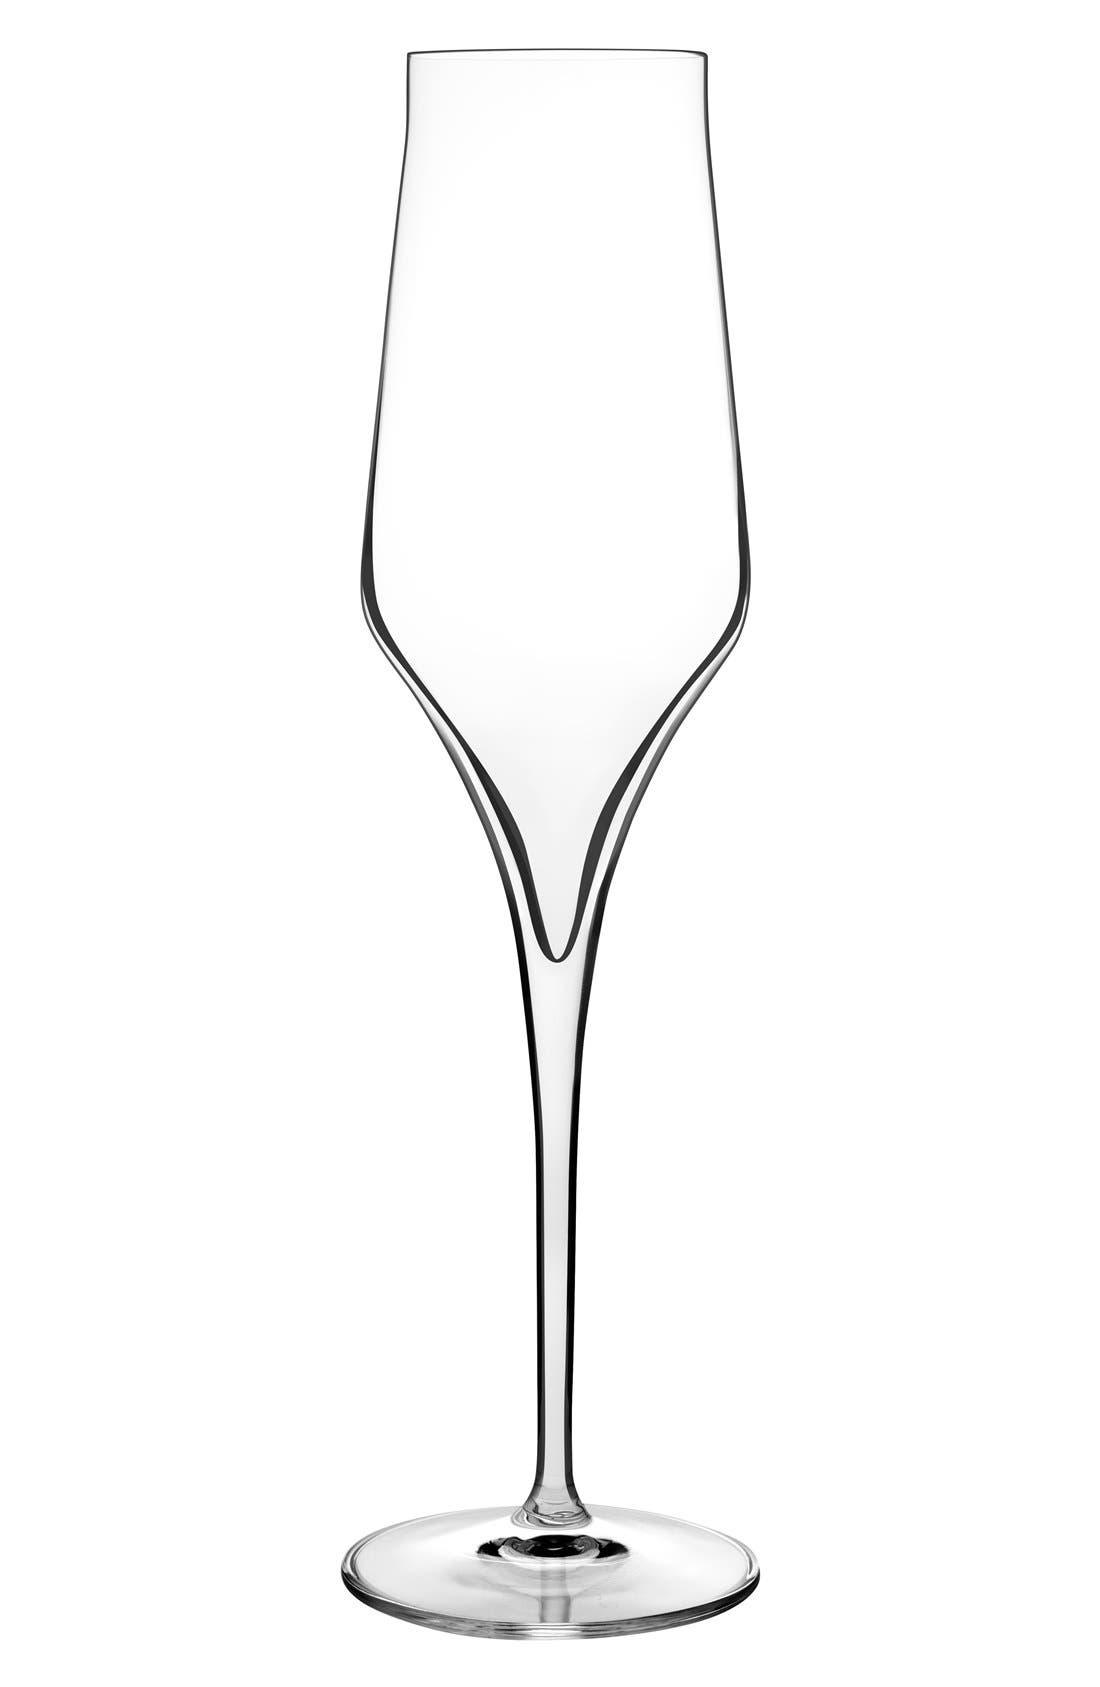 Main Image - Luigi Bormioli 'Supremo' Champagne Flutes (Set of 2)